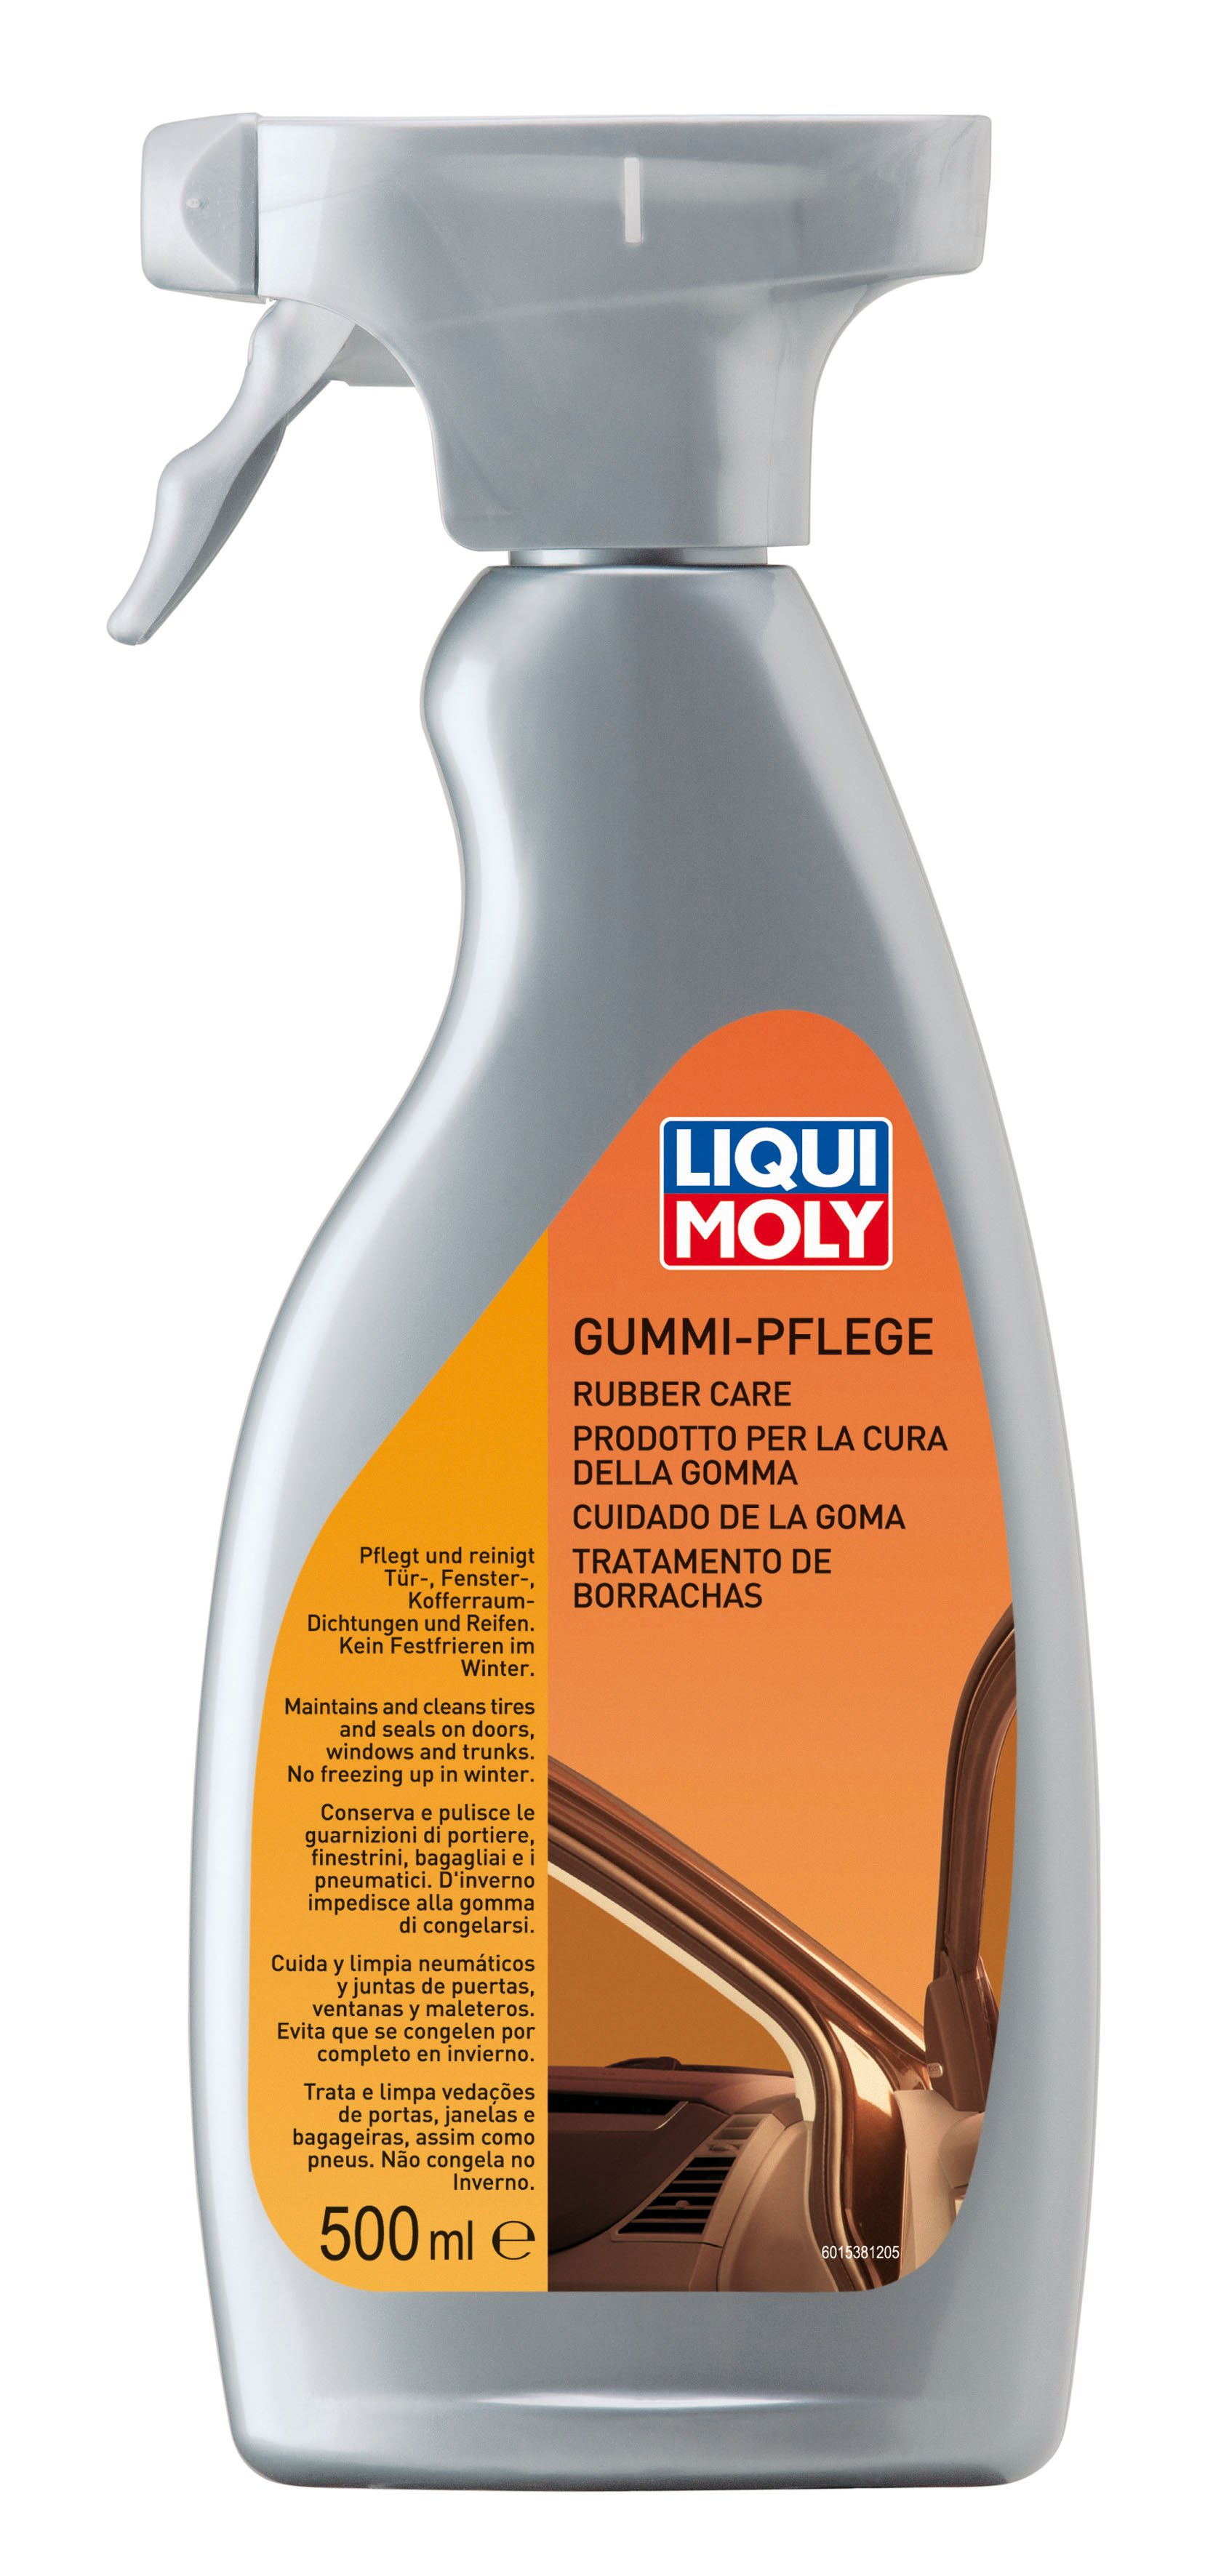 Gummi-Pflege